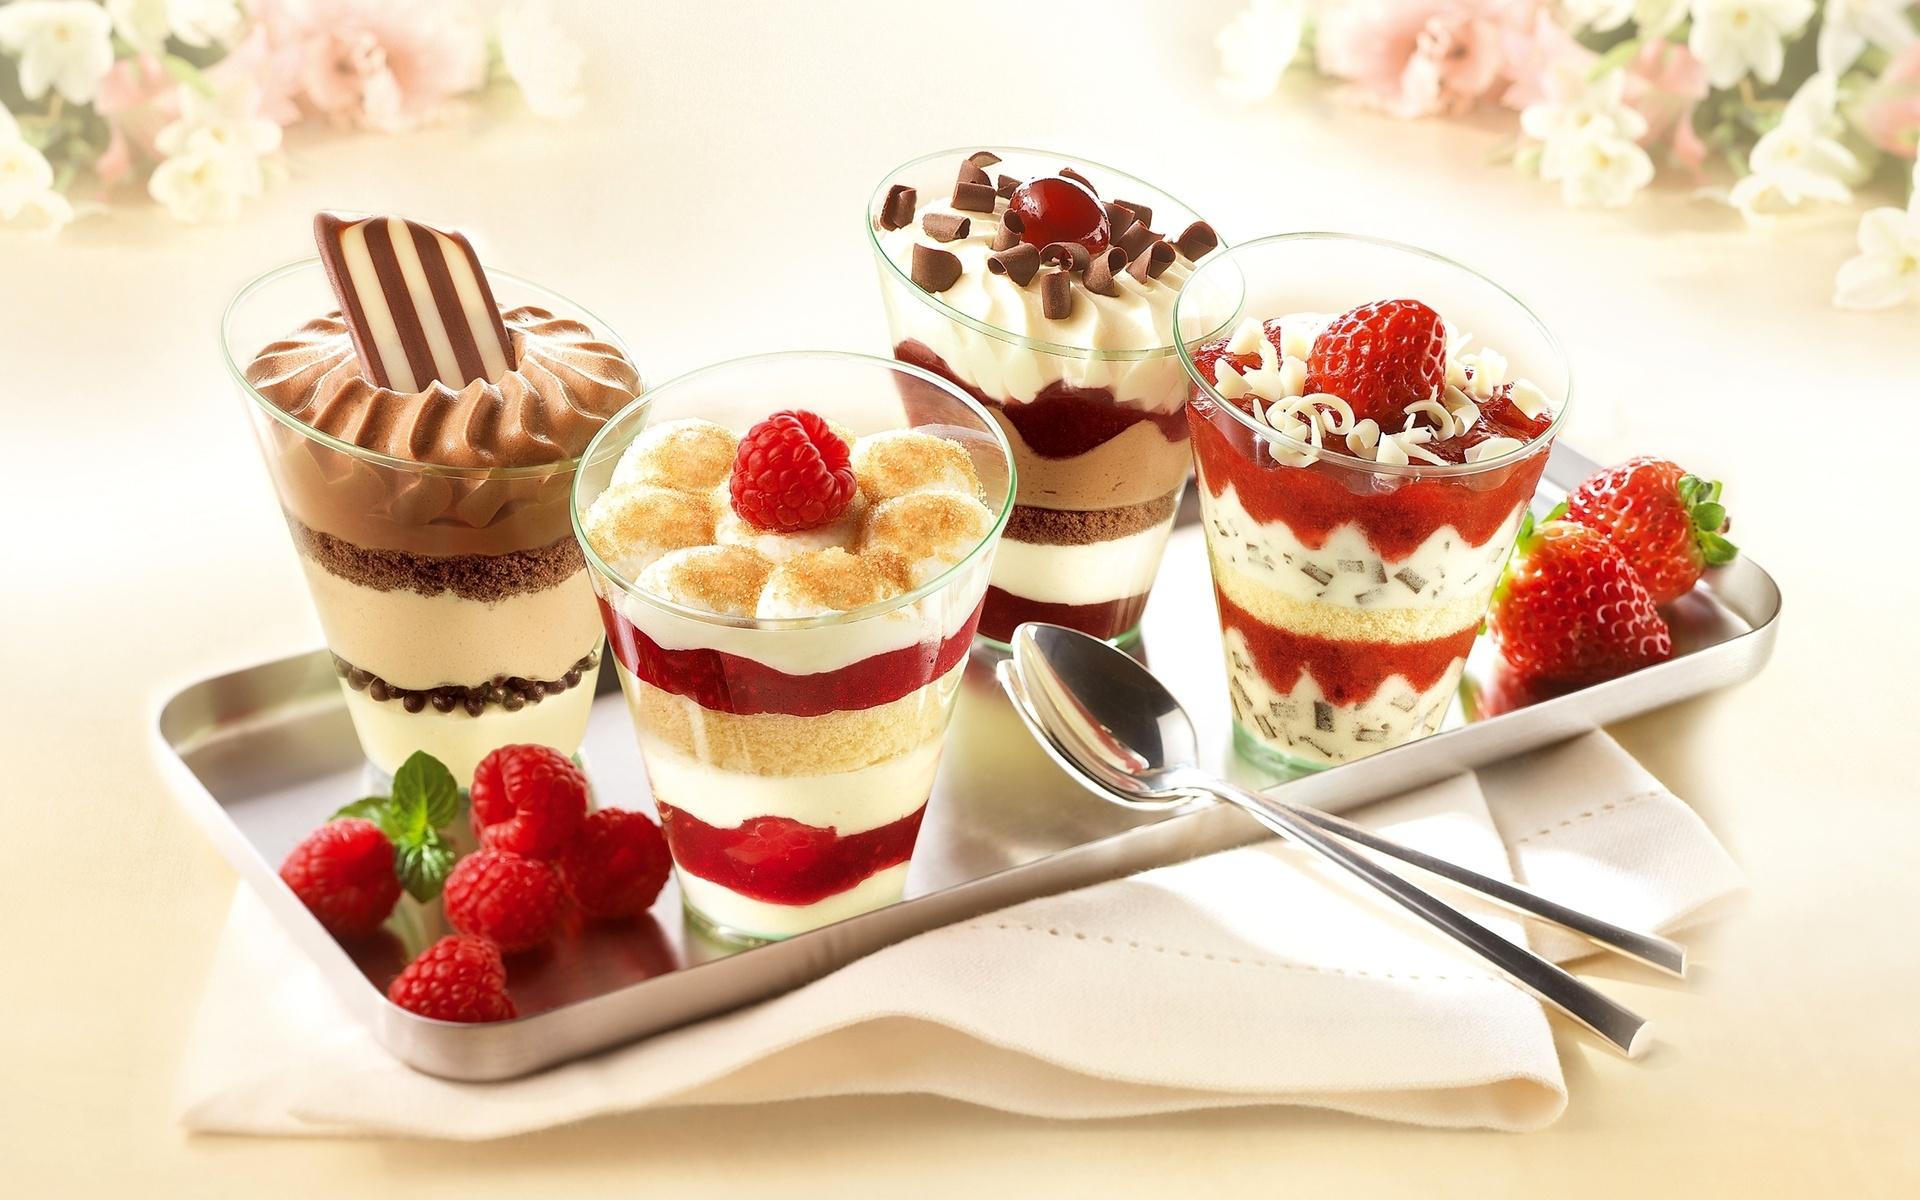 Dessert Backgrounds on Wallpapers Vista